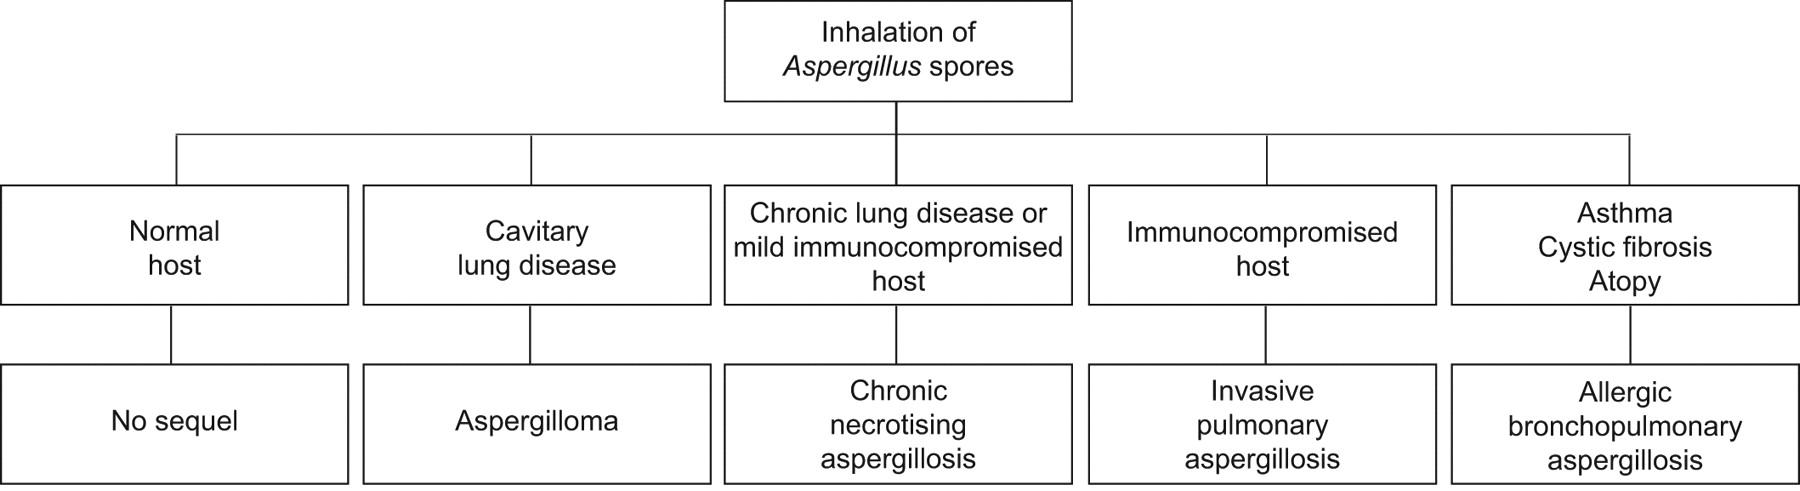 Pulmonary aspergillosis: a clinical review | European